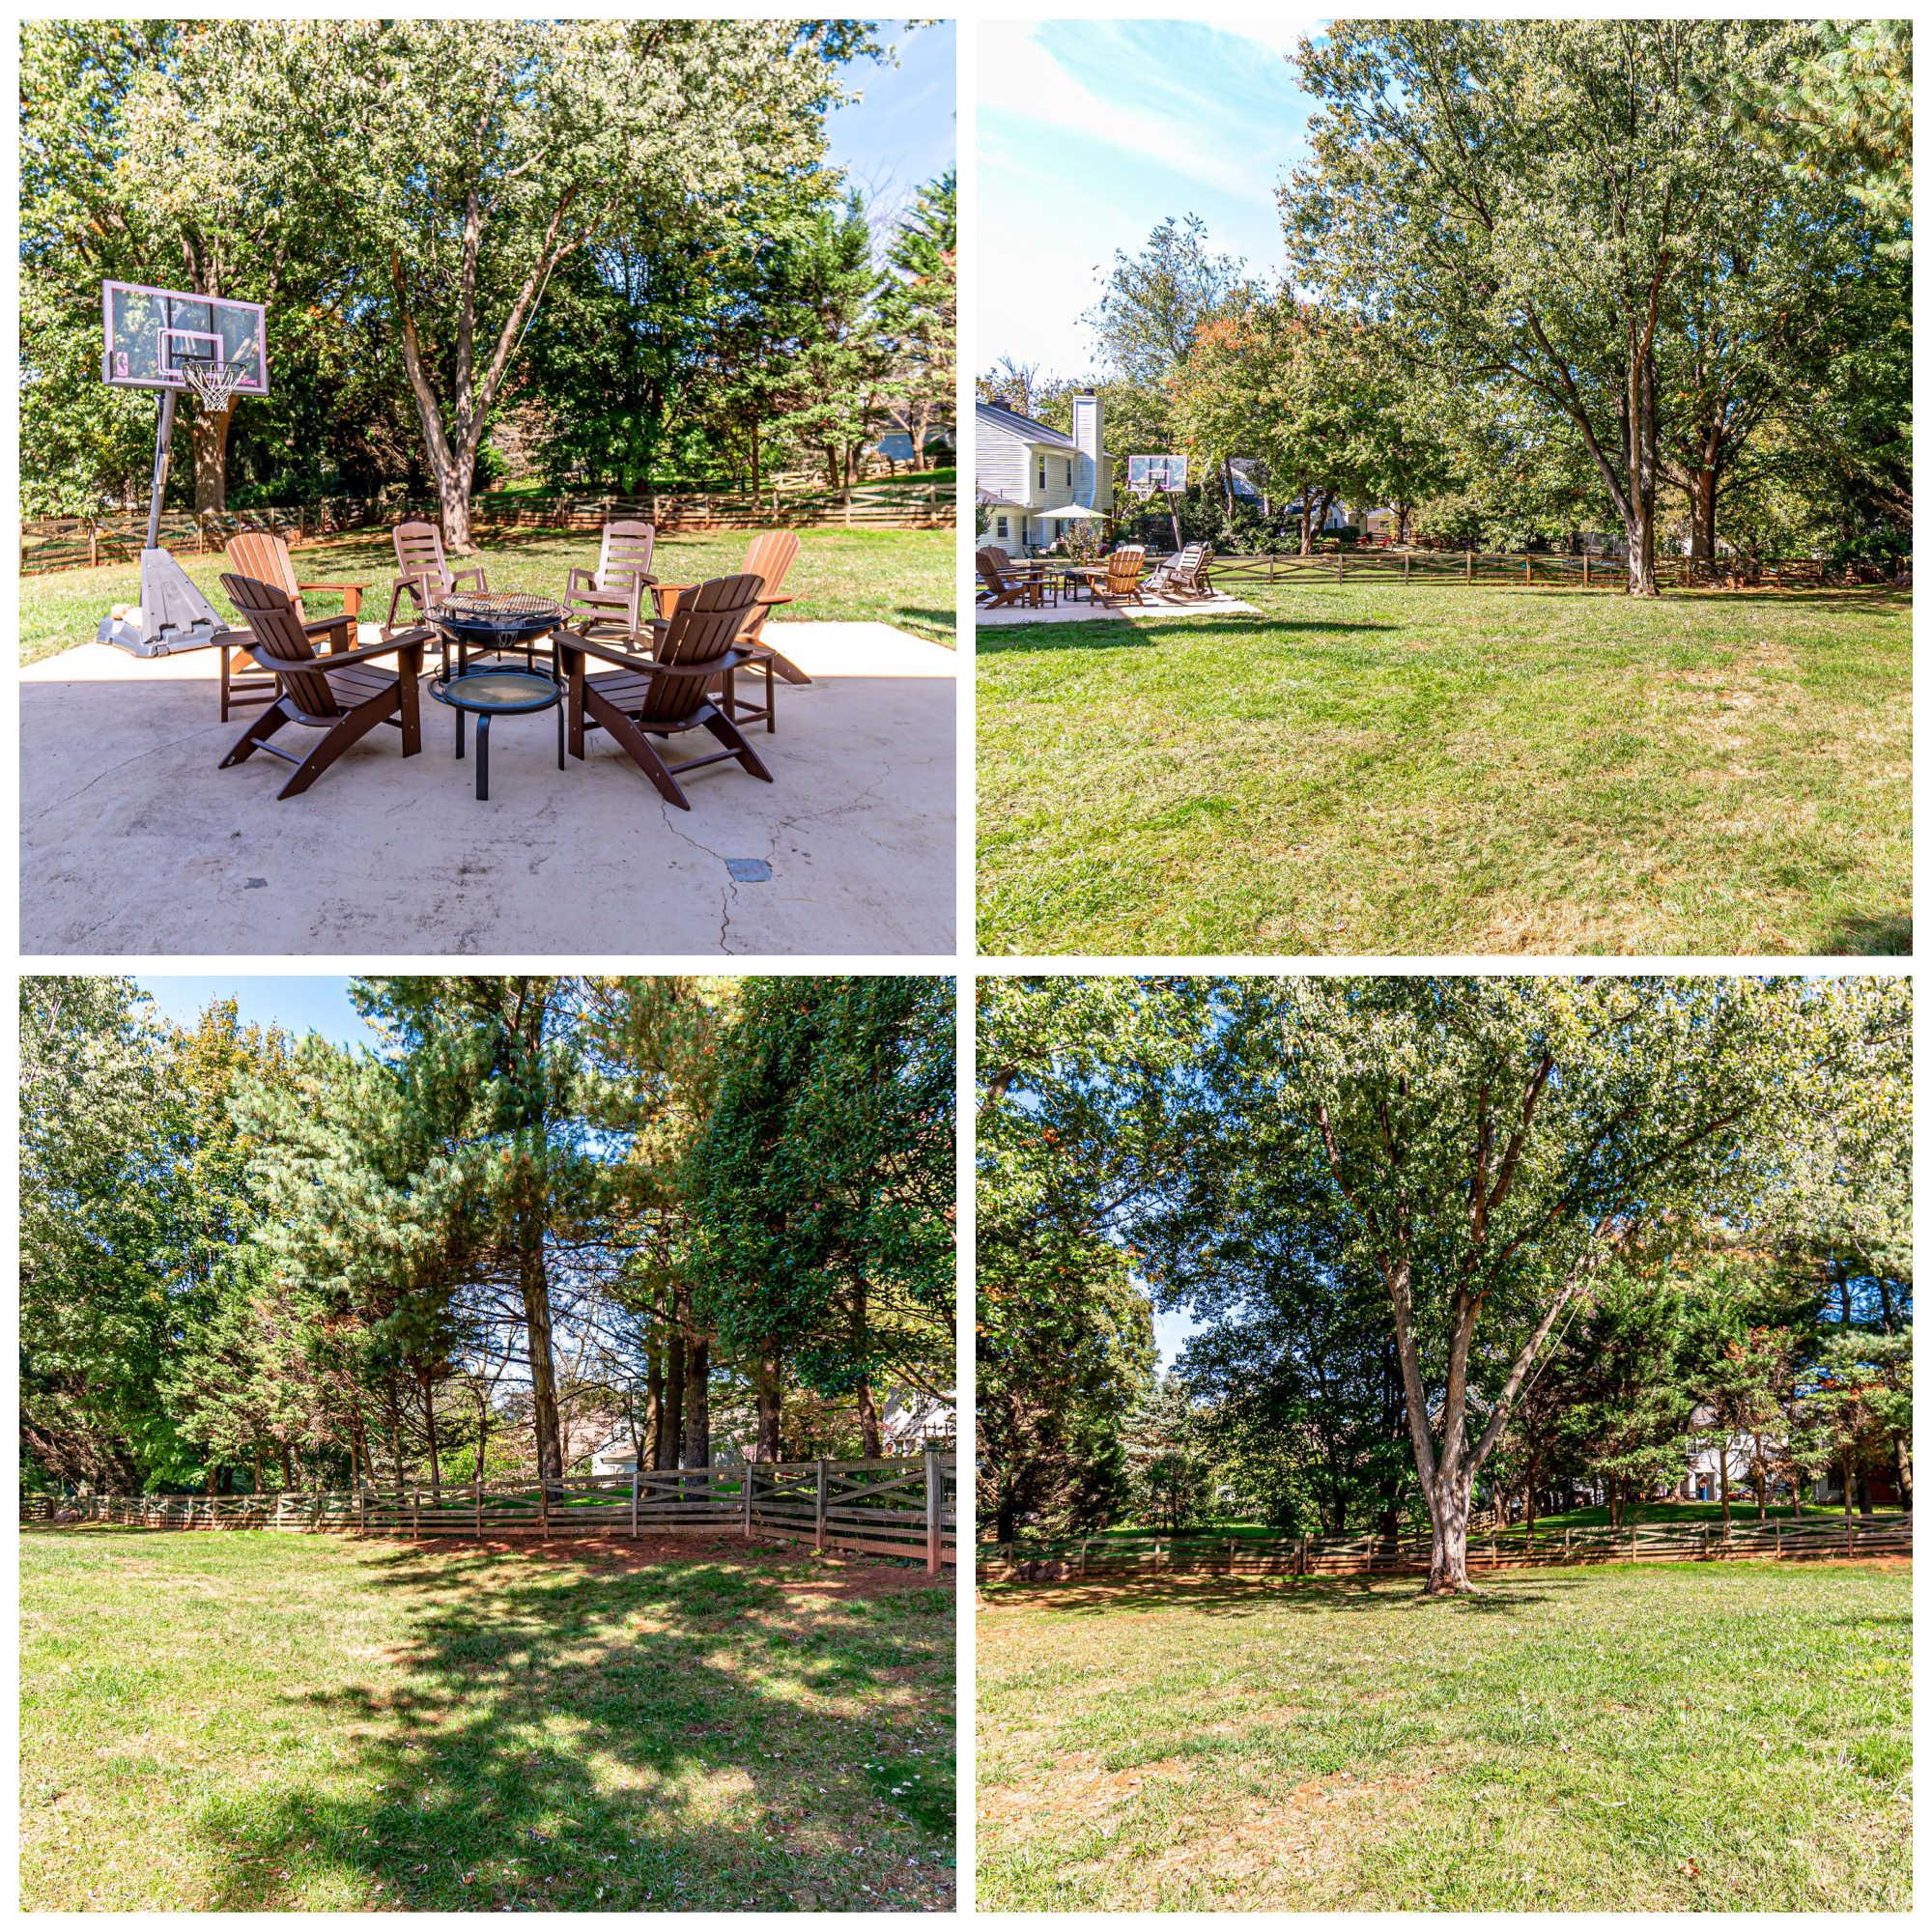 114 Peyton Rd, Countryside, Sterling- Backyard